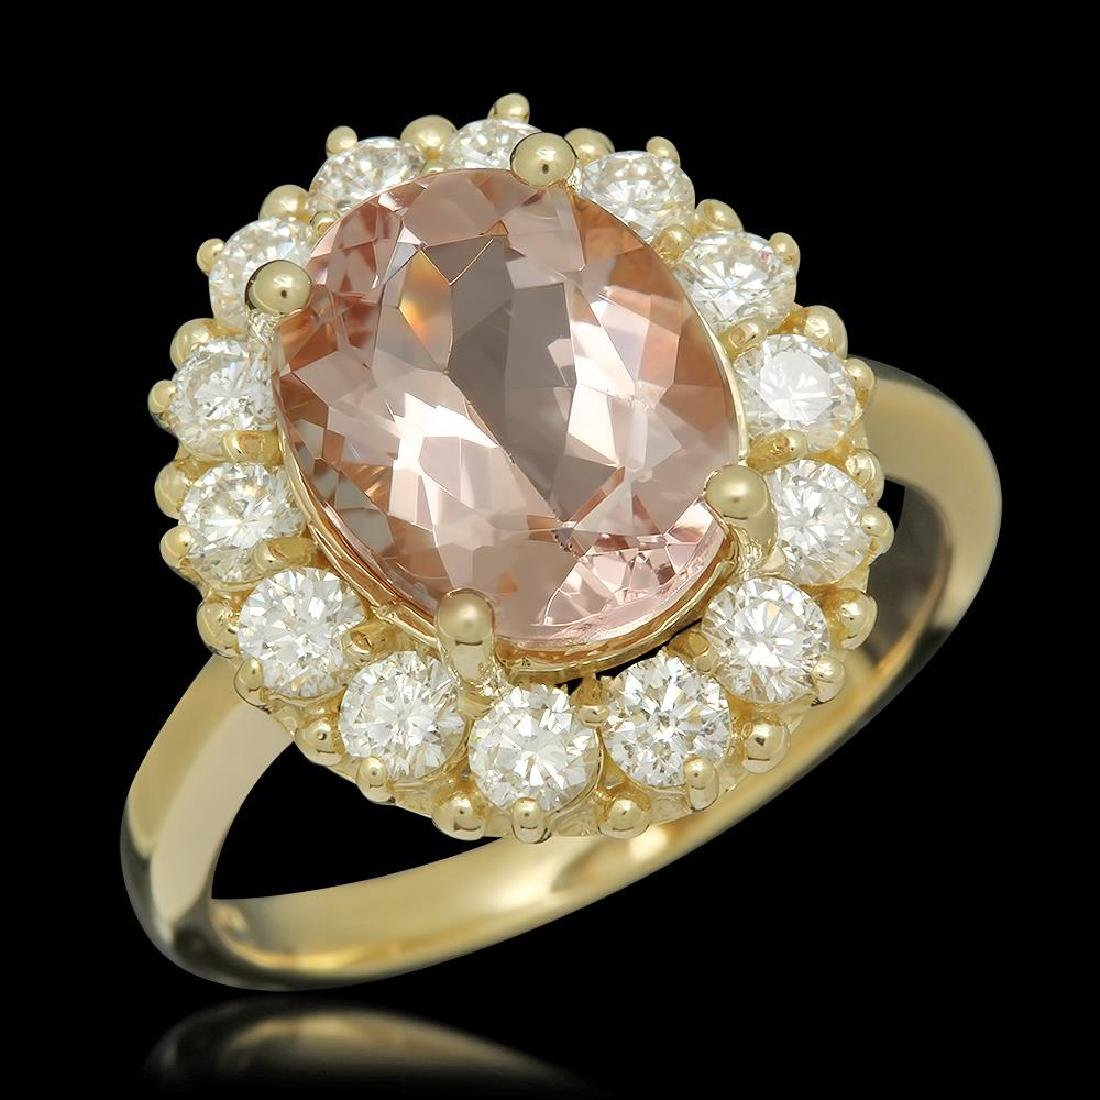 14K Gold 3.23ct Morganite 1.09ct Diamond Ring